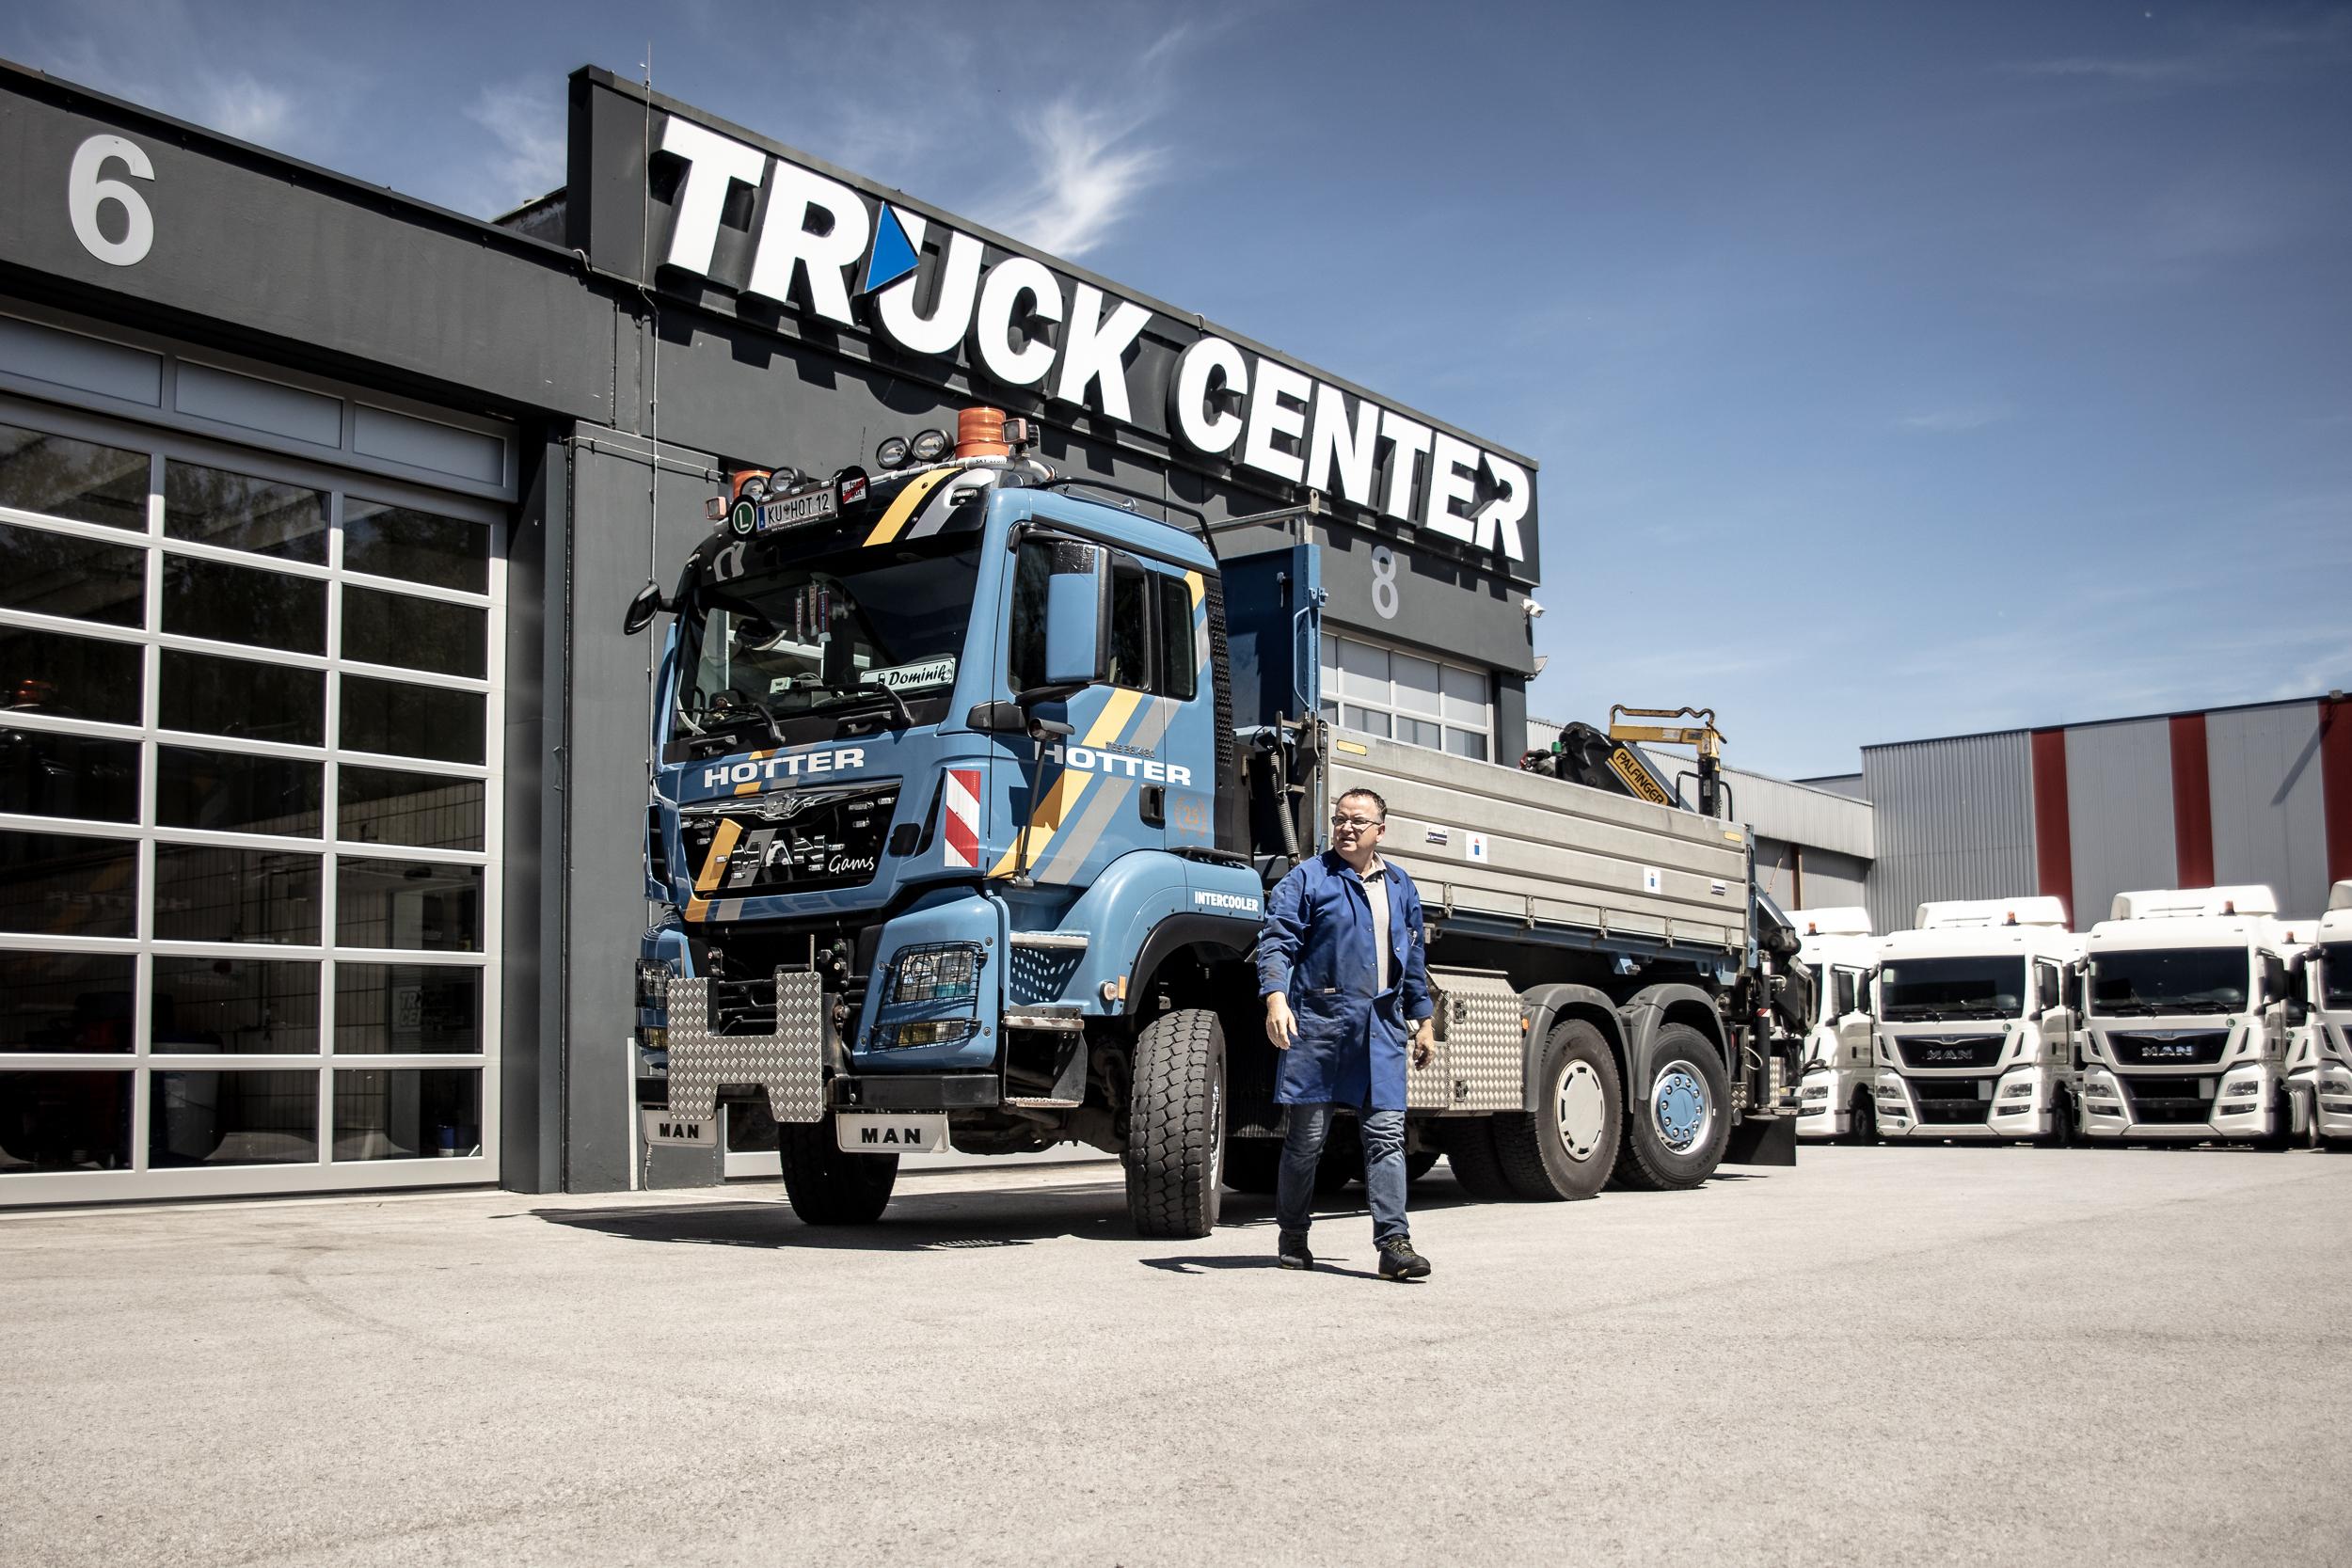 truckcenter_hotter-1